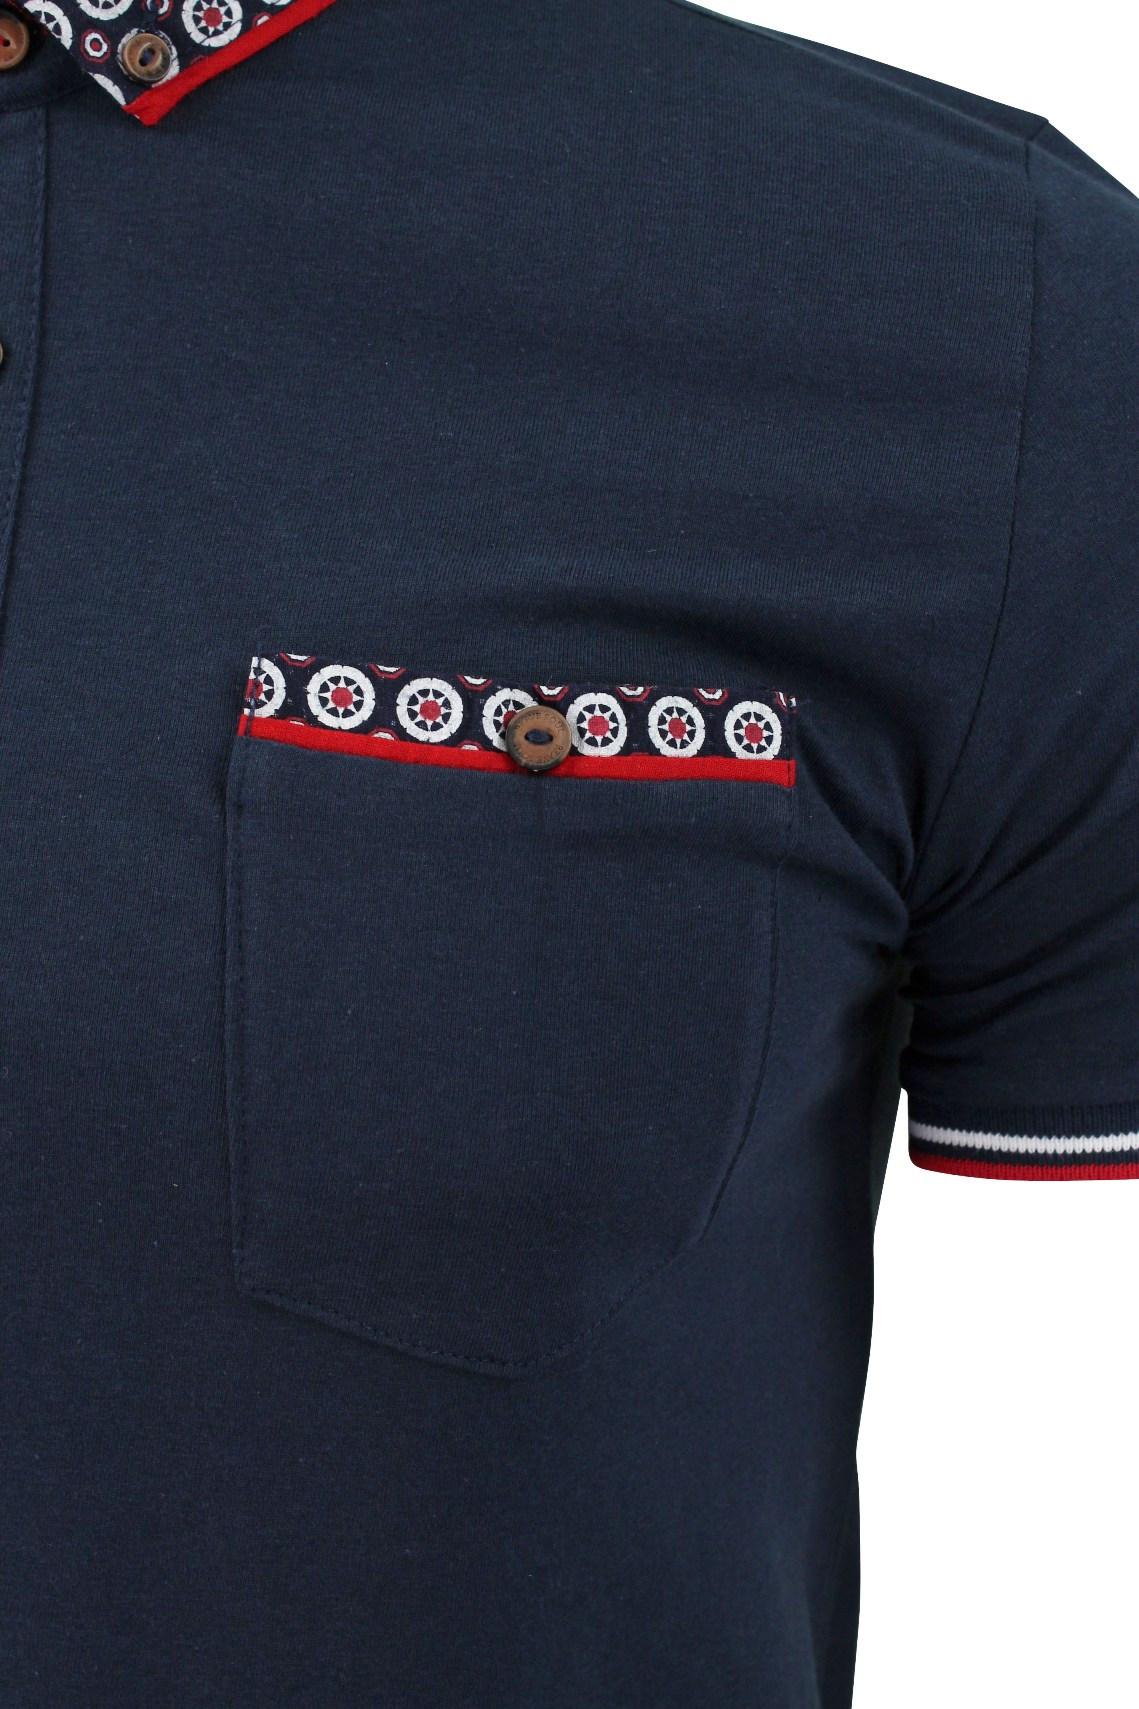 Mens-Polo-T-Shirt-Chimera-Brave-Soul-Denim-Chambray-Collar-Short-Sleeved-Cotton thumbnail 42